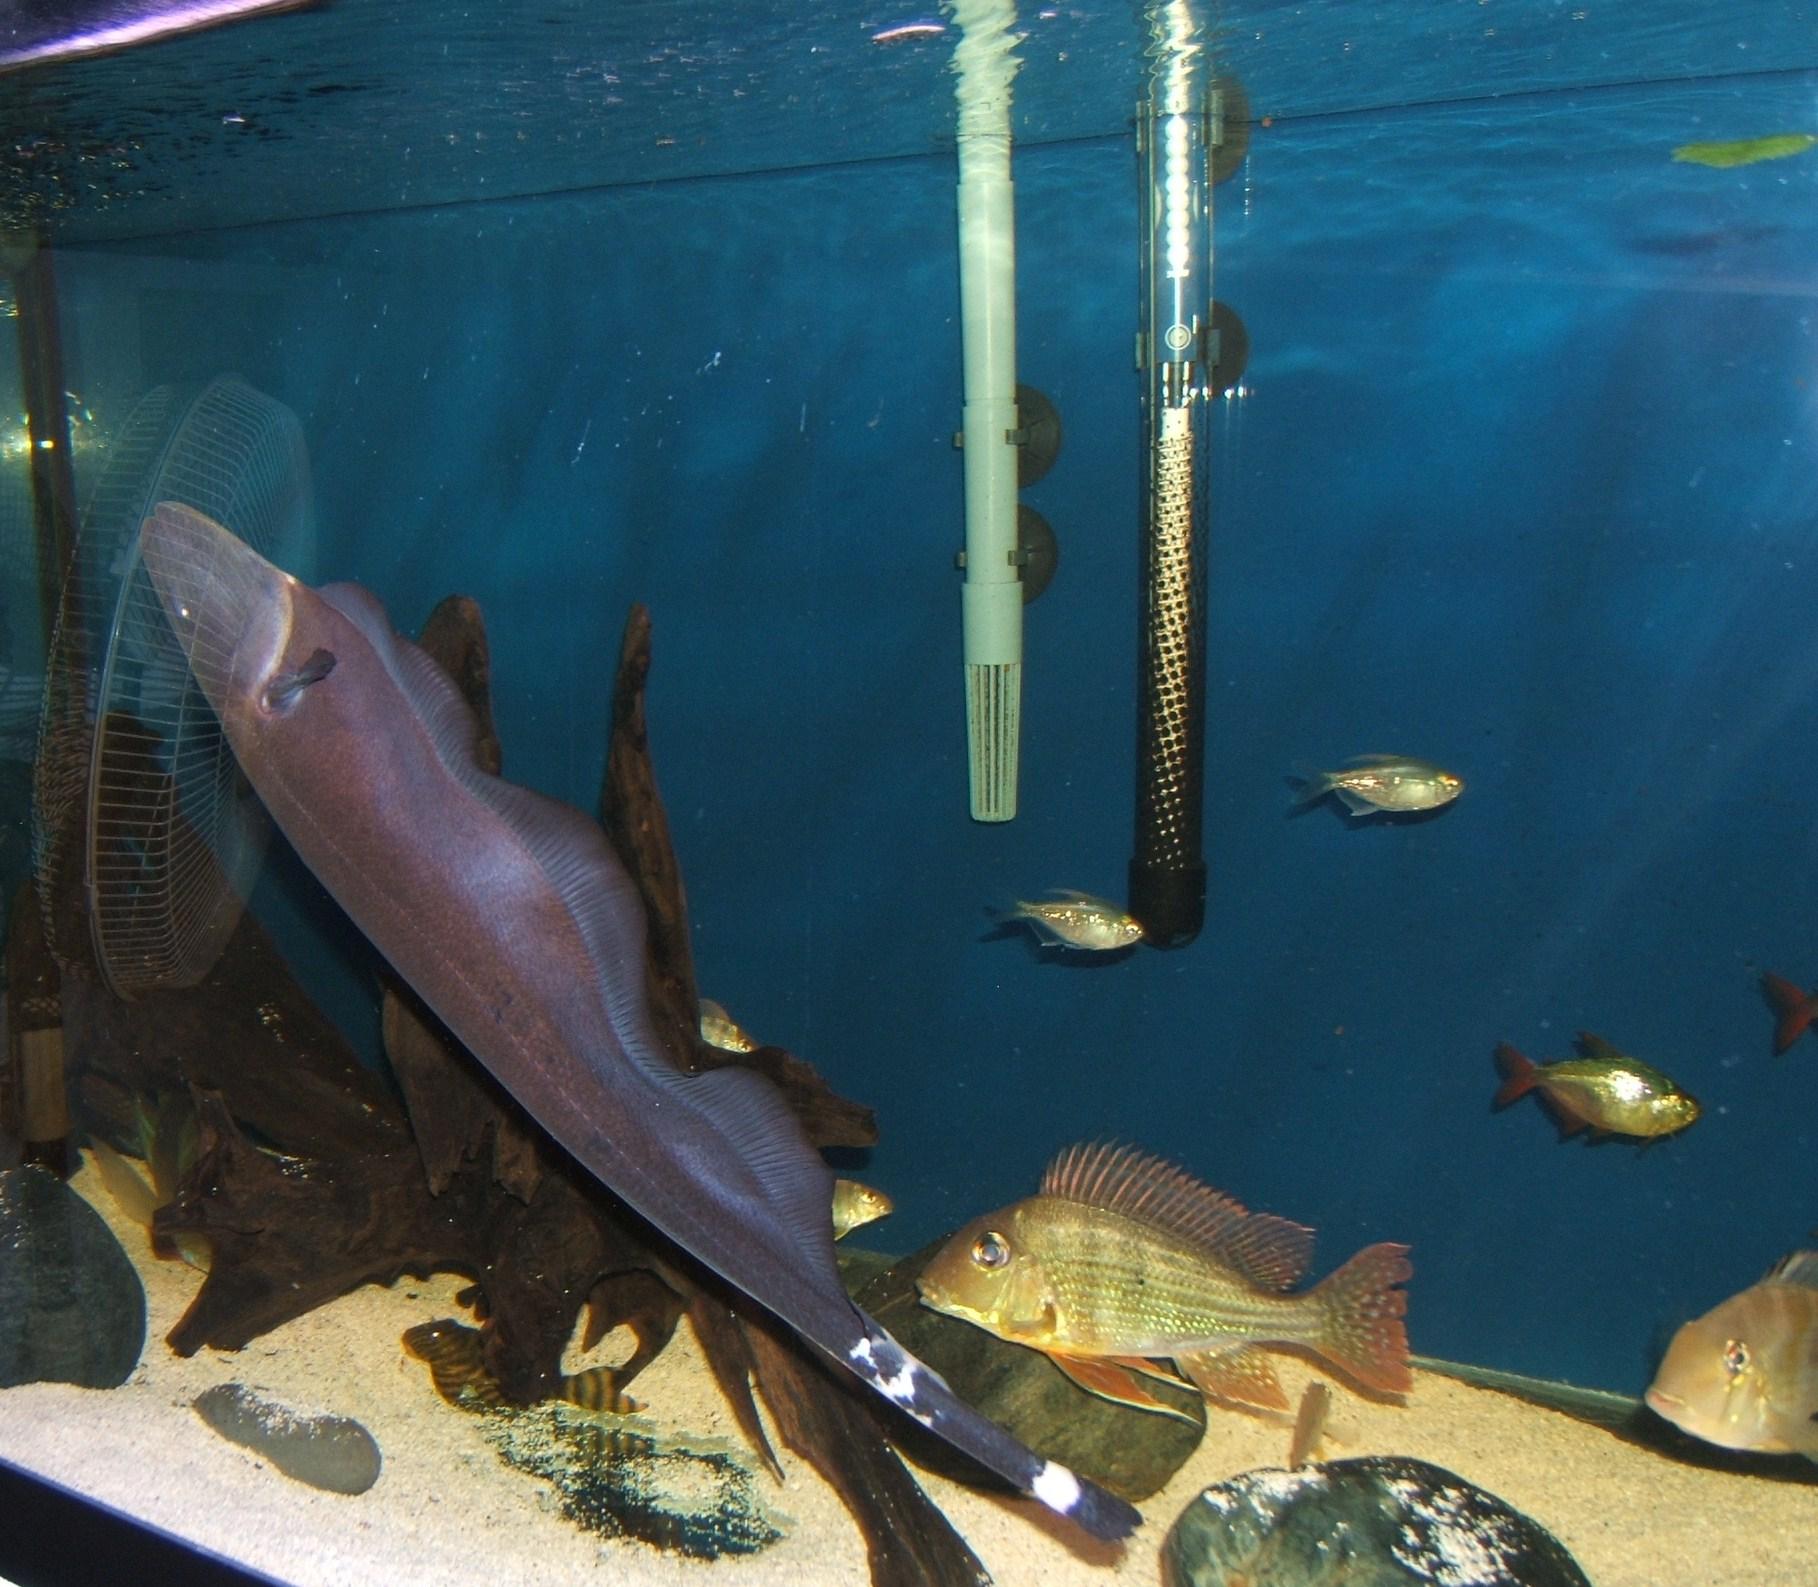 Black ghost knife fish - photo#23